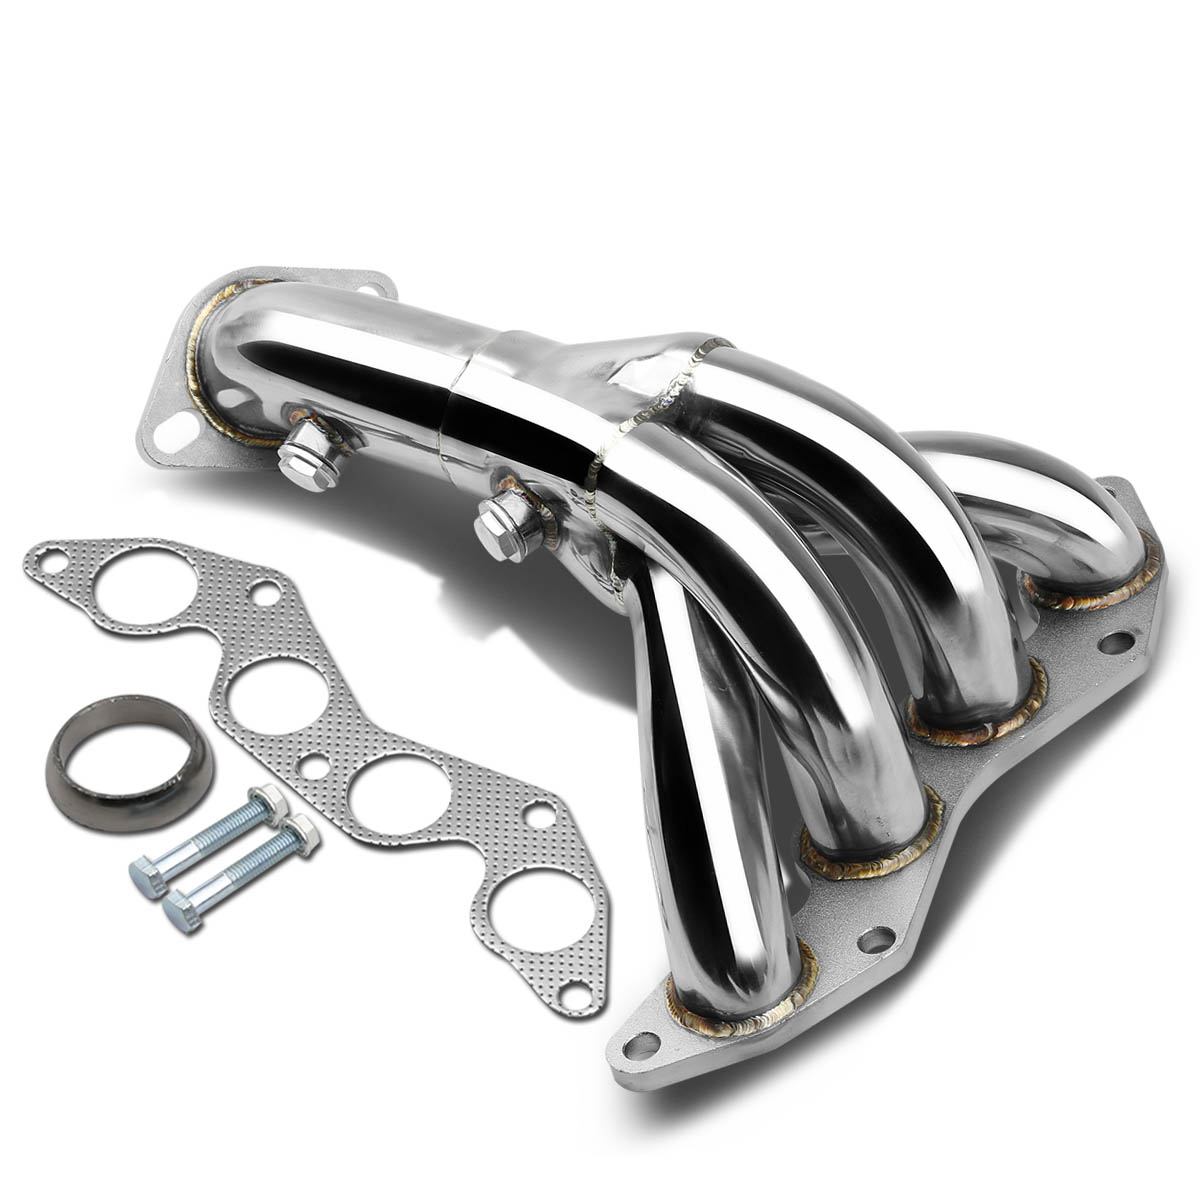 for 2001 to 2005 honda civic 4 1 design stainless steel exhaust header kit 7 gen em es d17a1 engine 02 03 04 walmart com